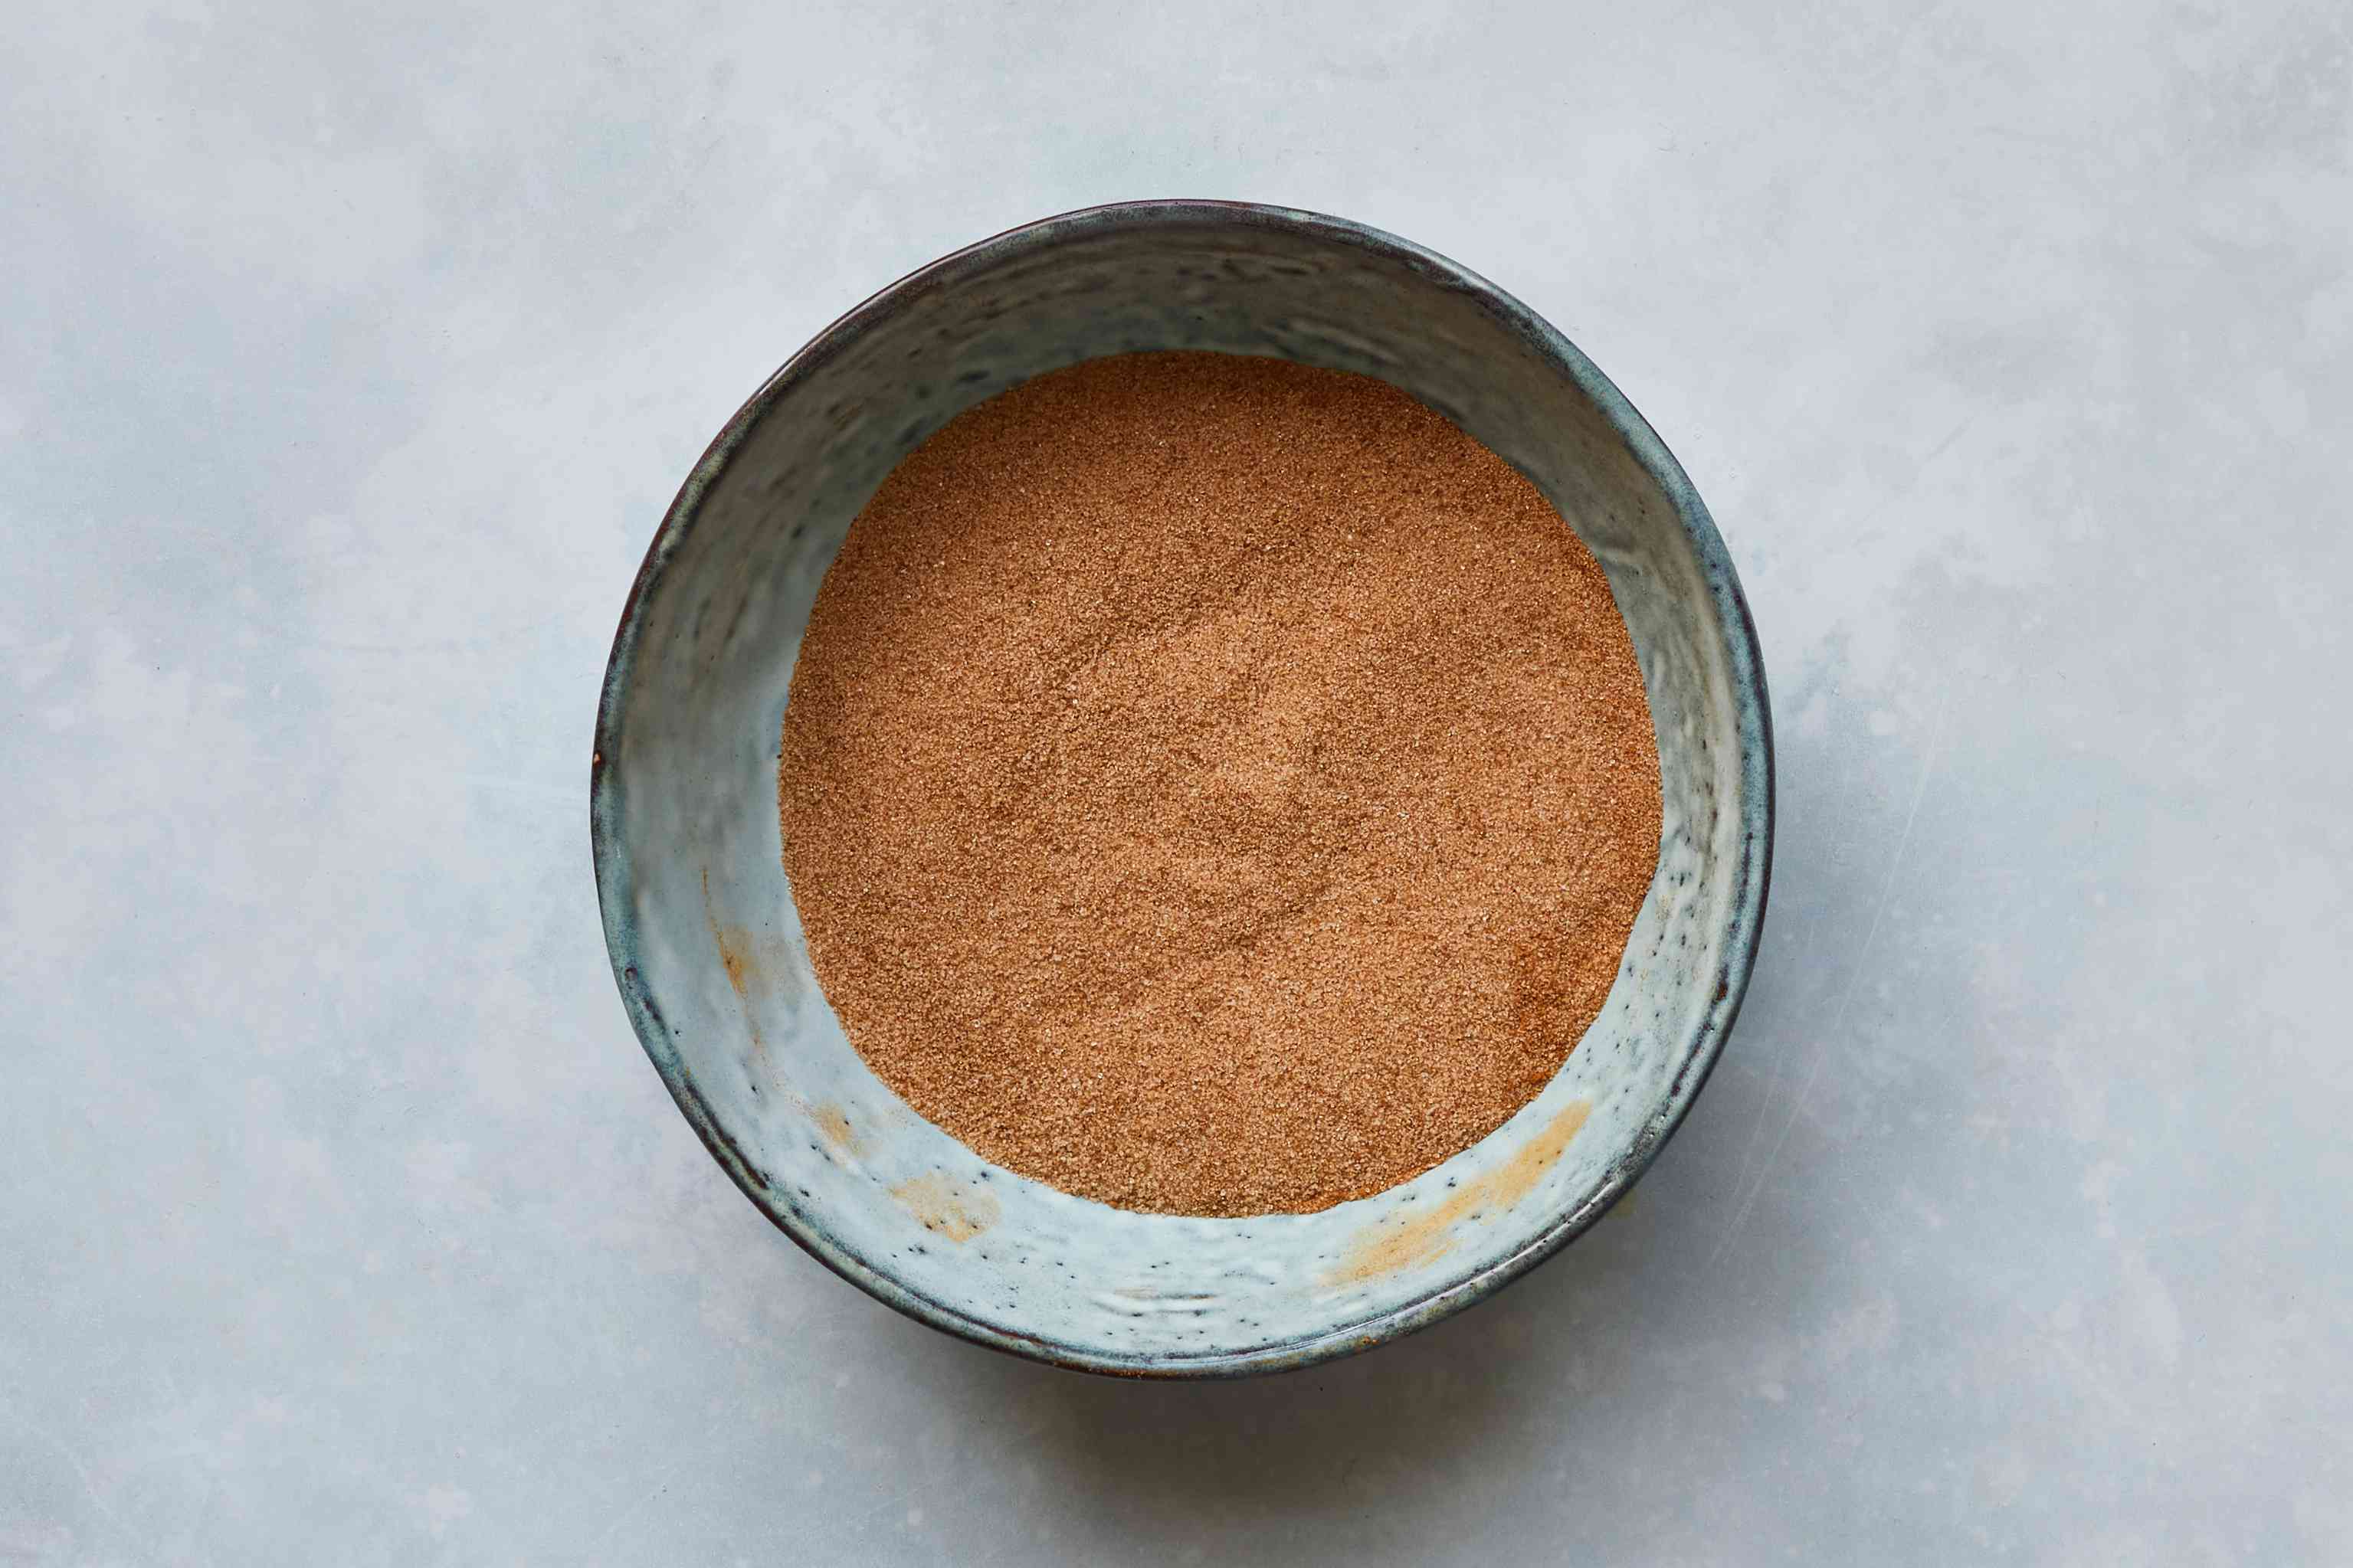 cinnamon and sugar in a bowl